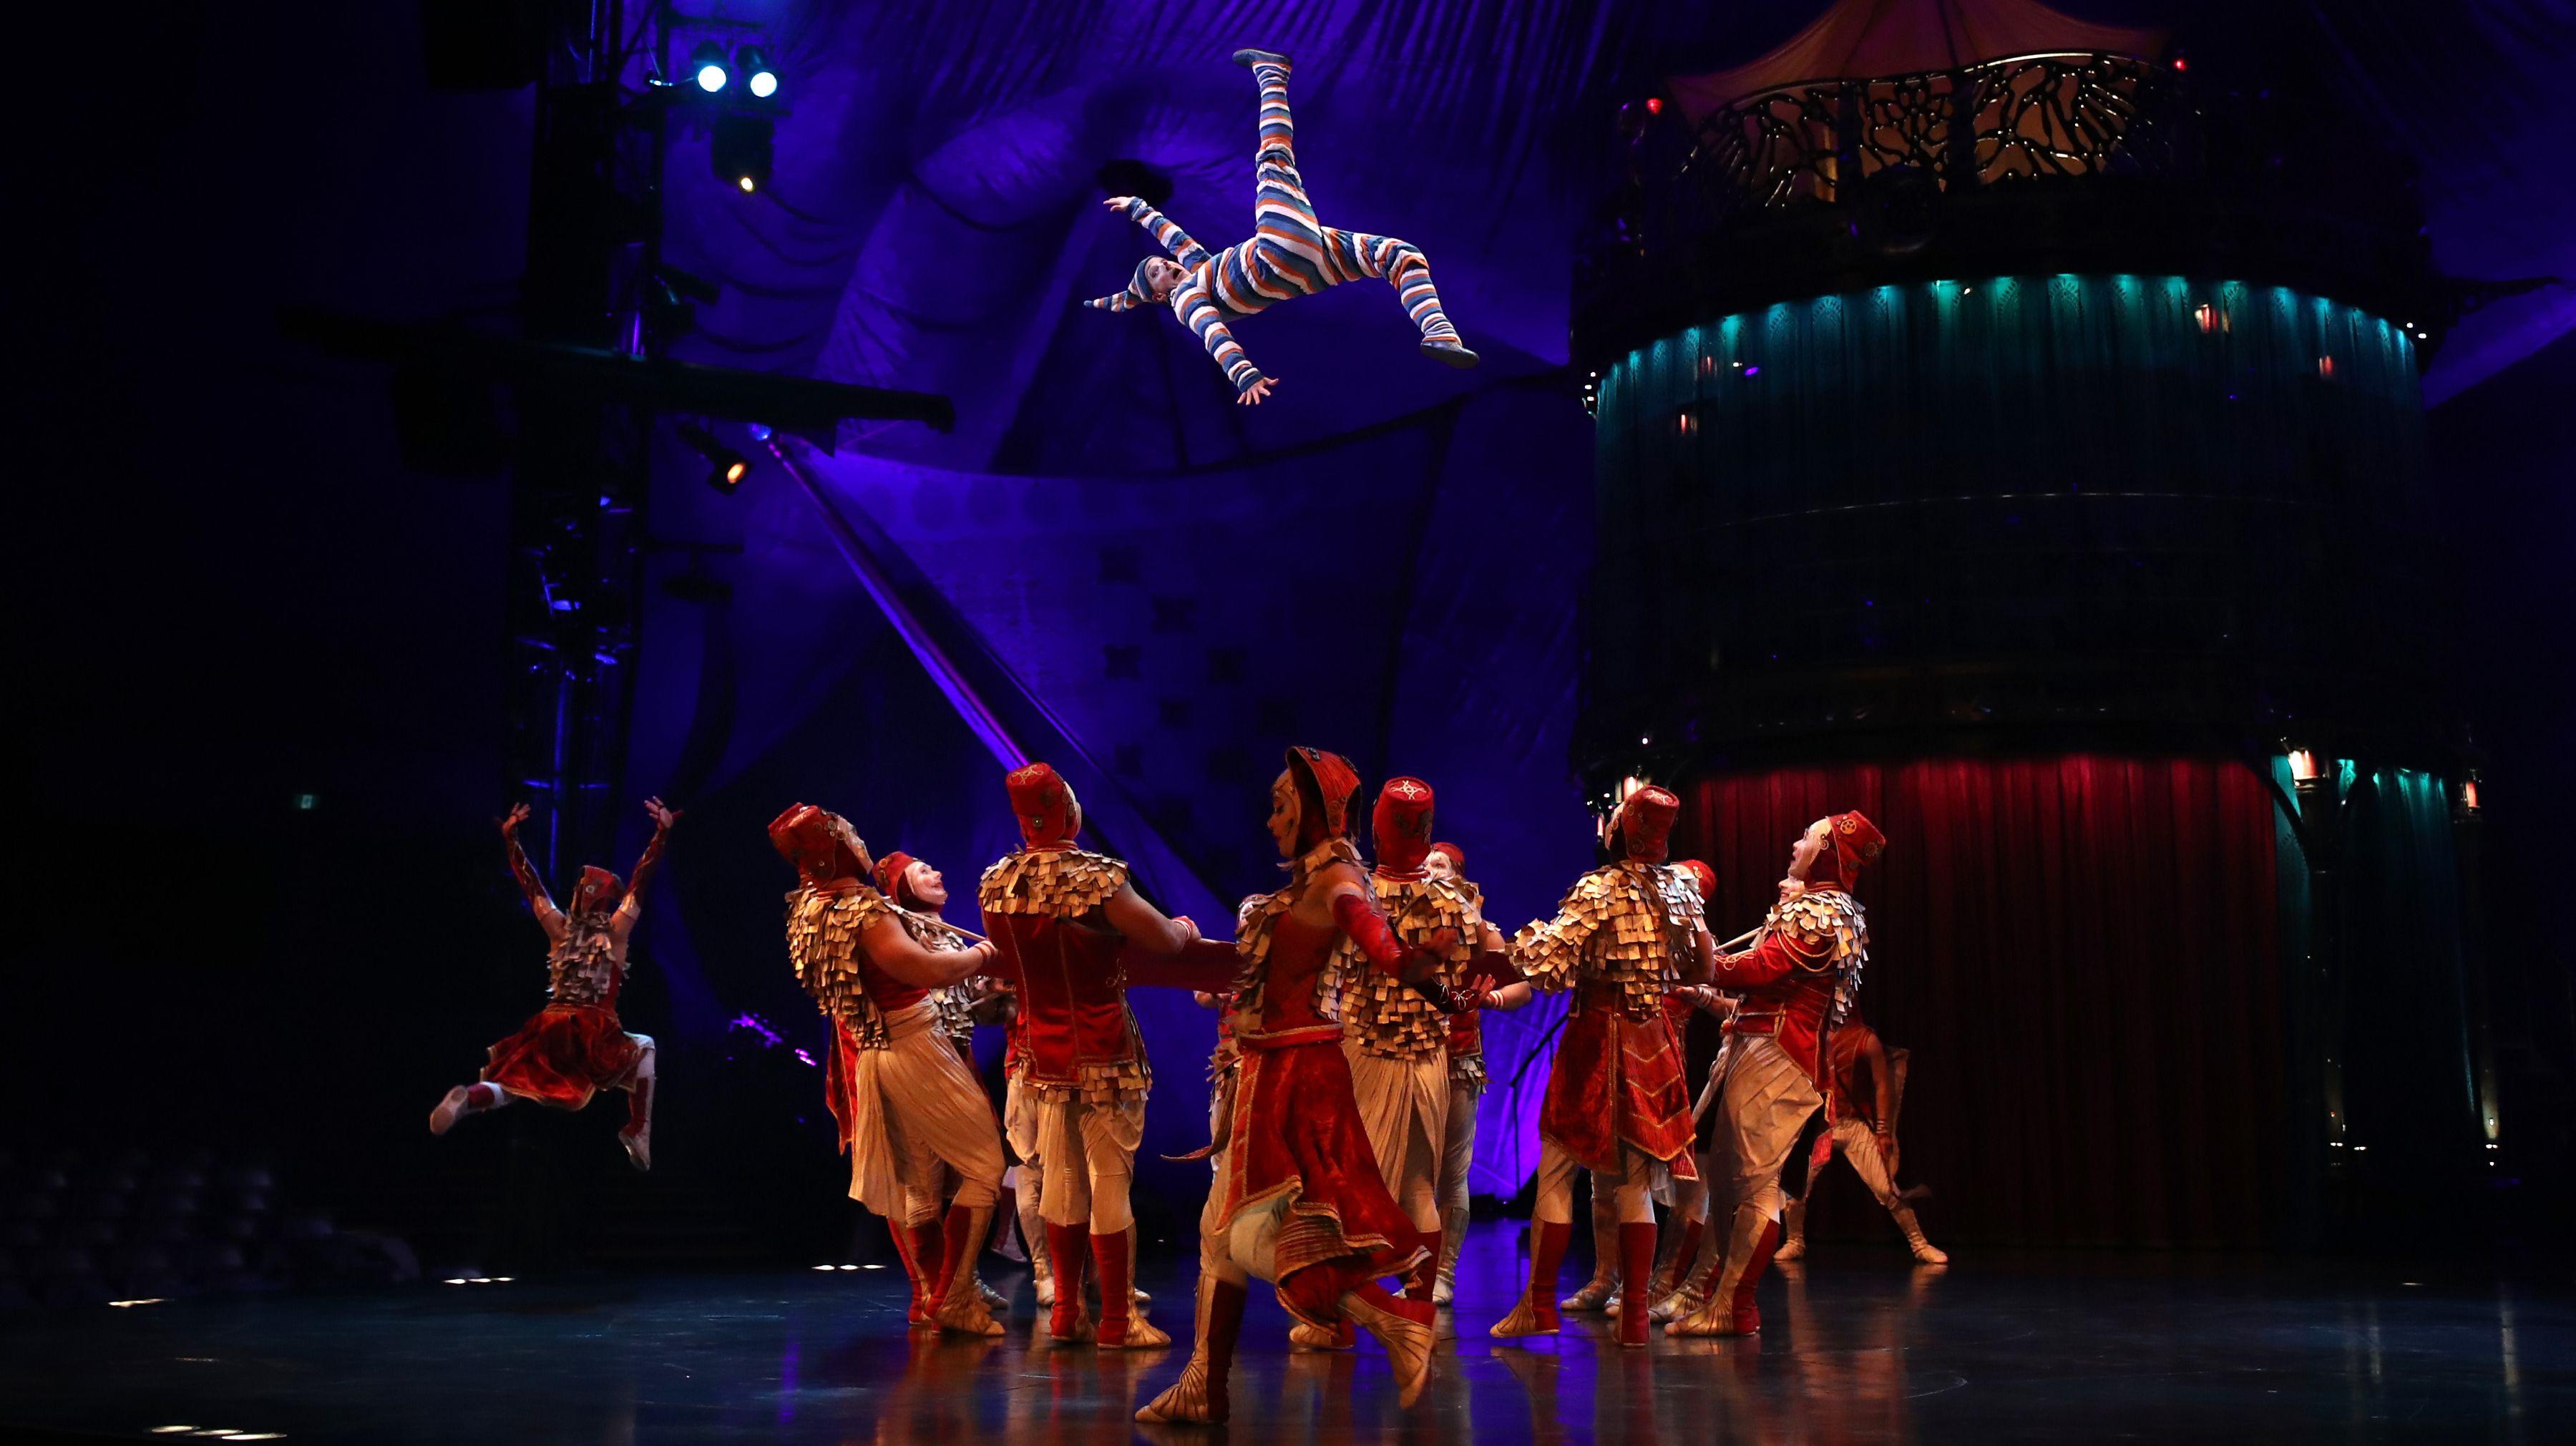 Tampa acrobat was attempting new Cirque du Soleil act. A ...   Cirque Du Soleil